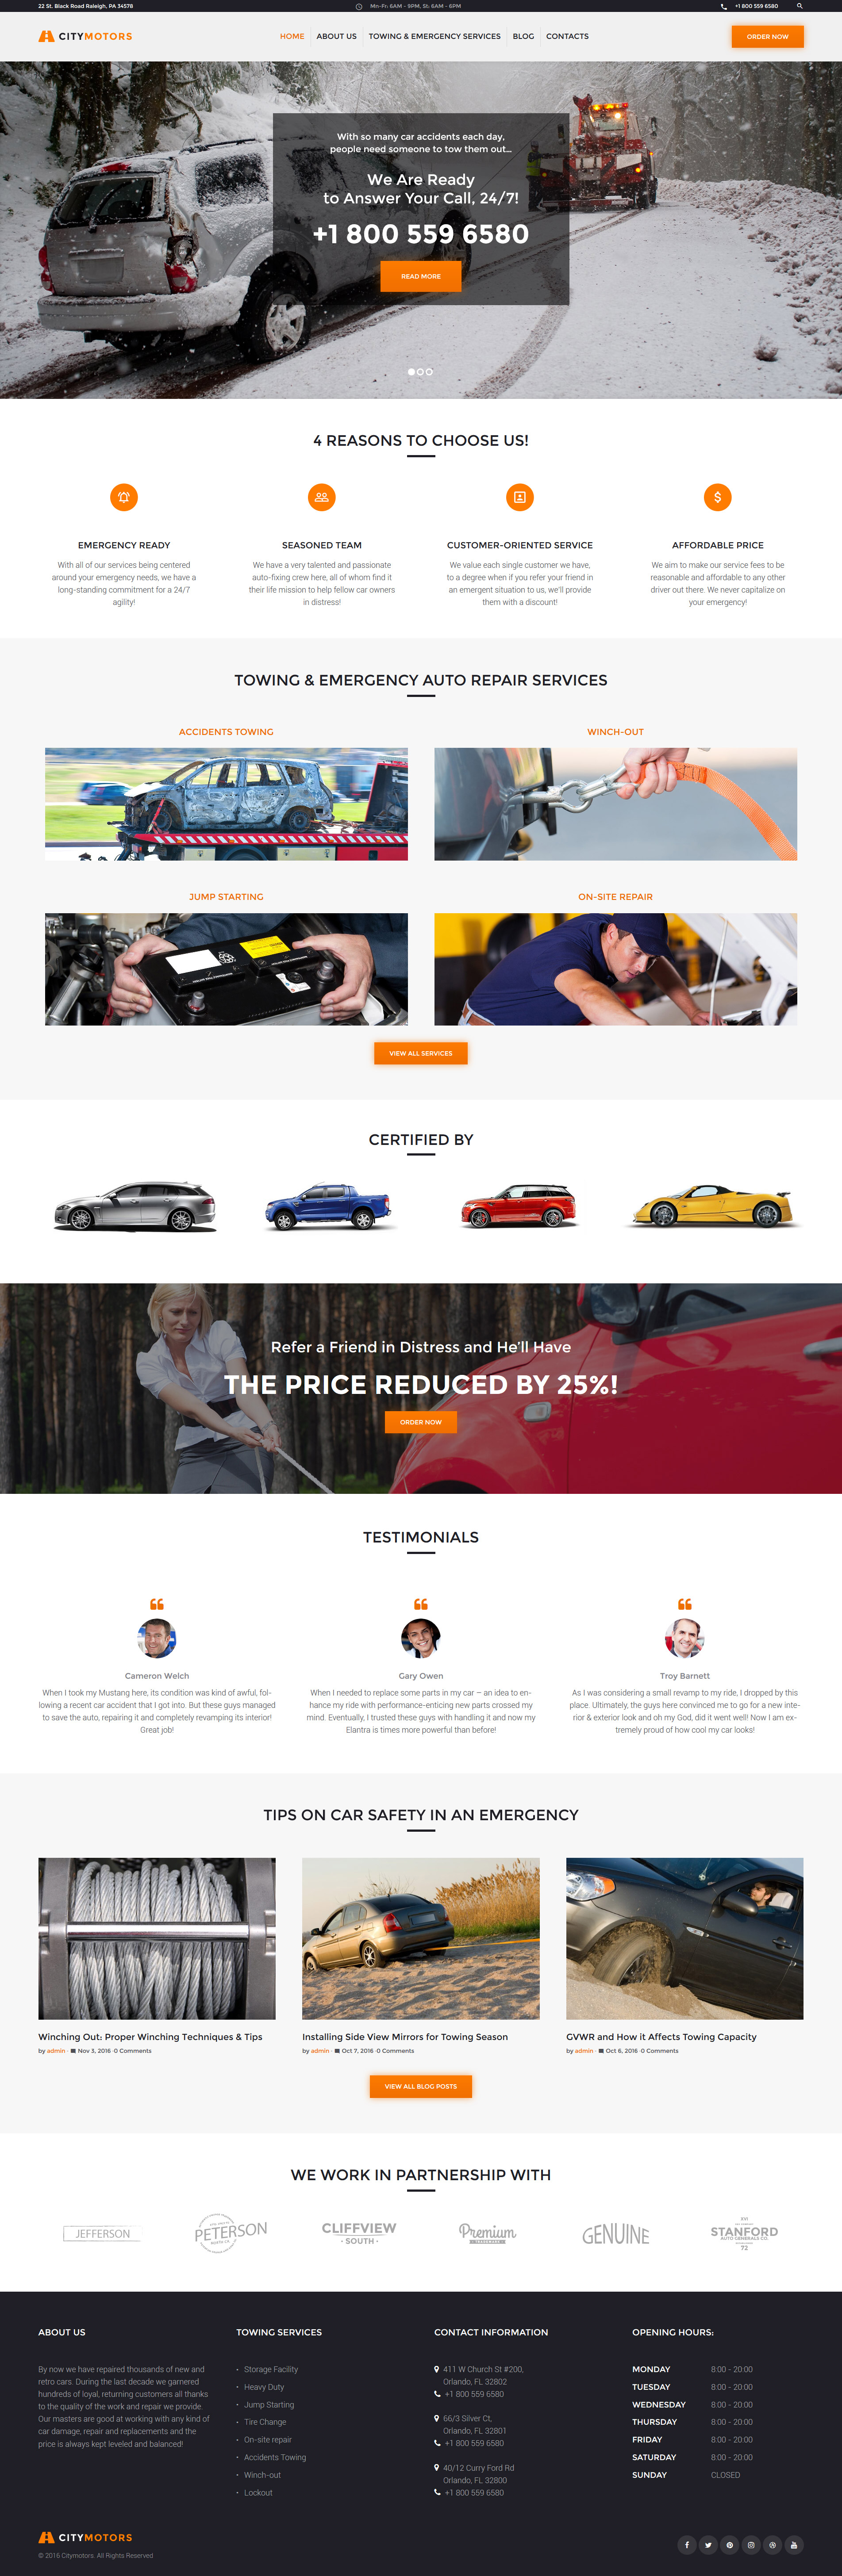 CityMotors - Auto Towing Company WordPress Theme - screenshot